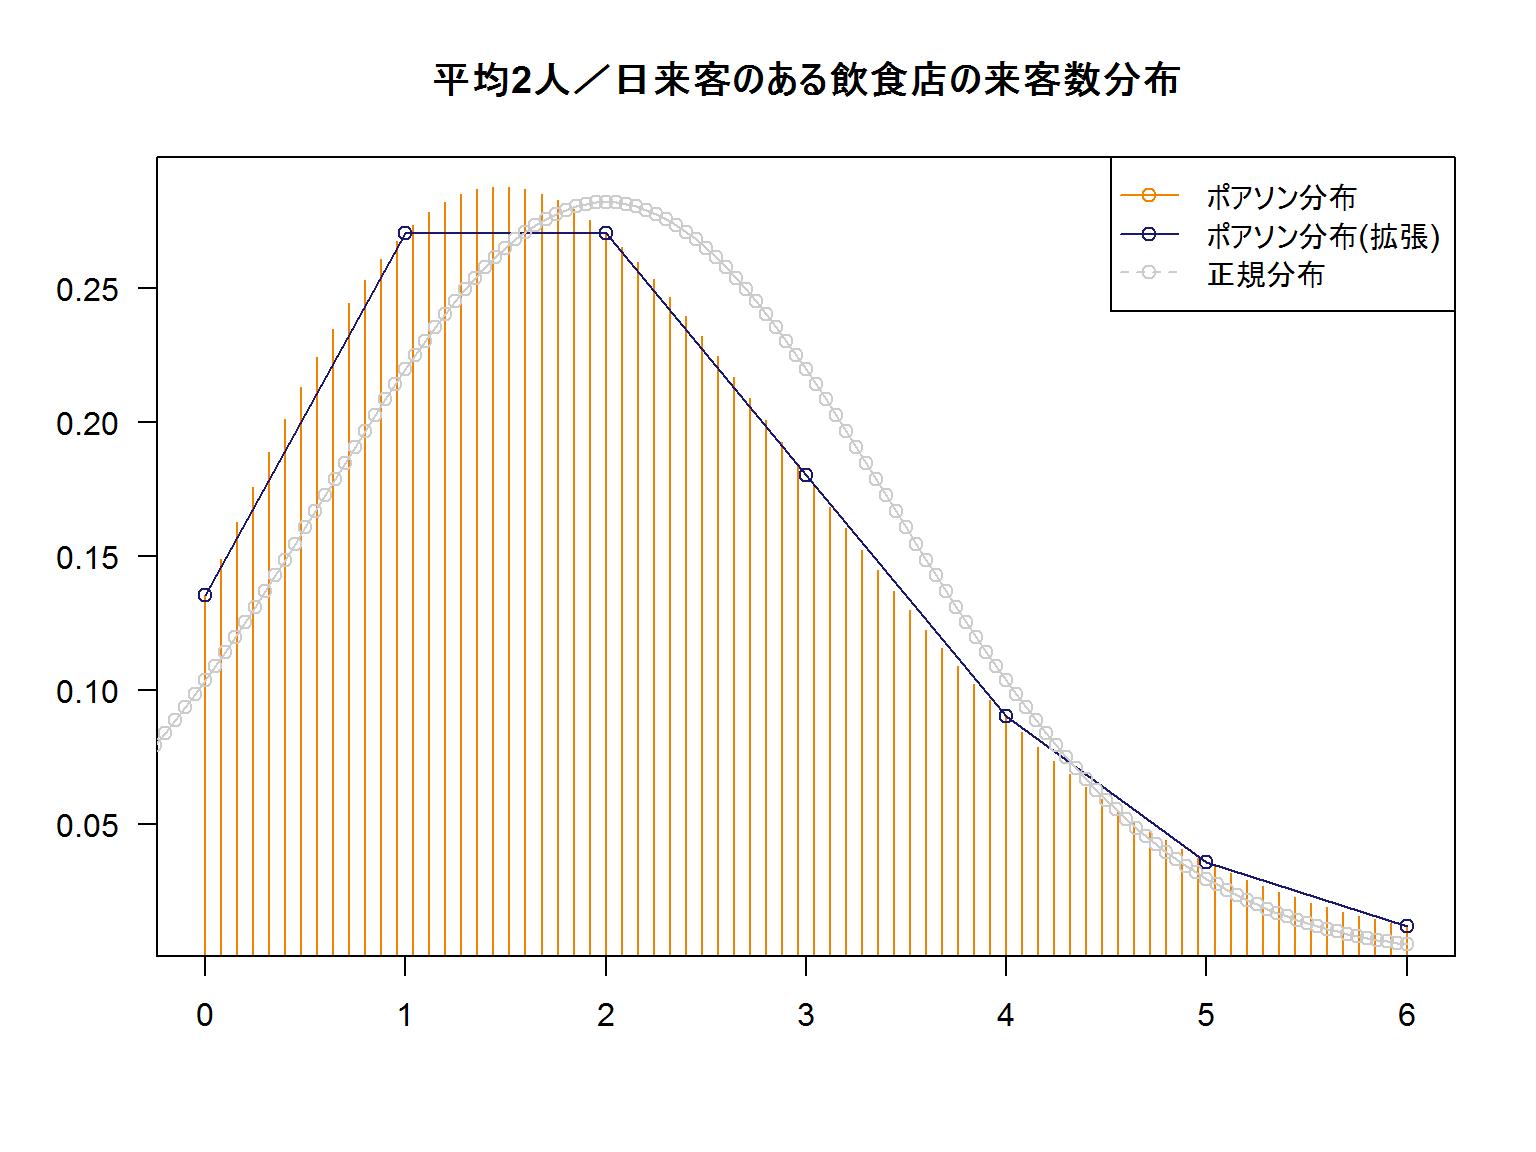 Poisson_distribution_6